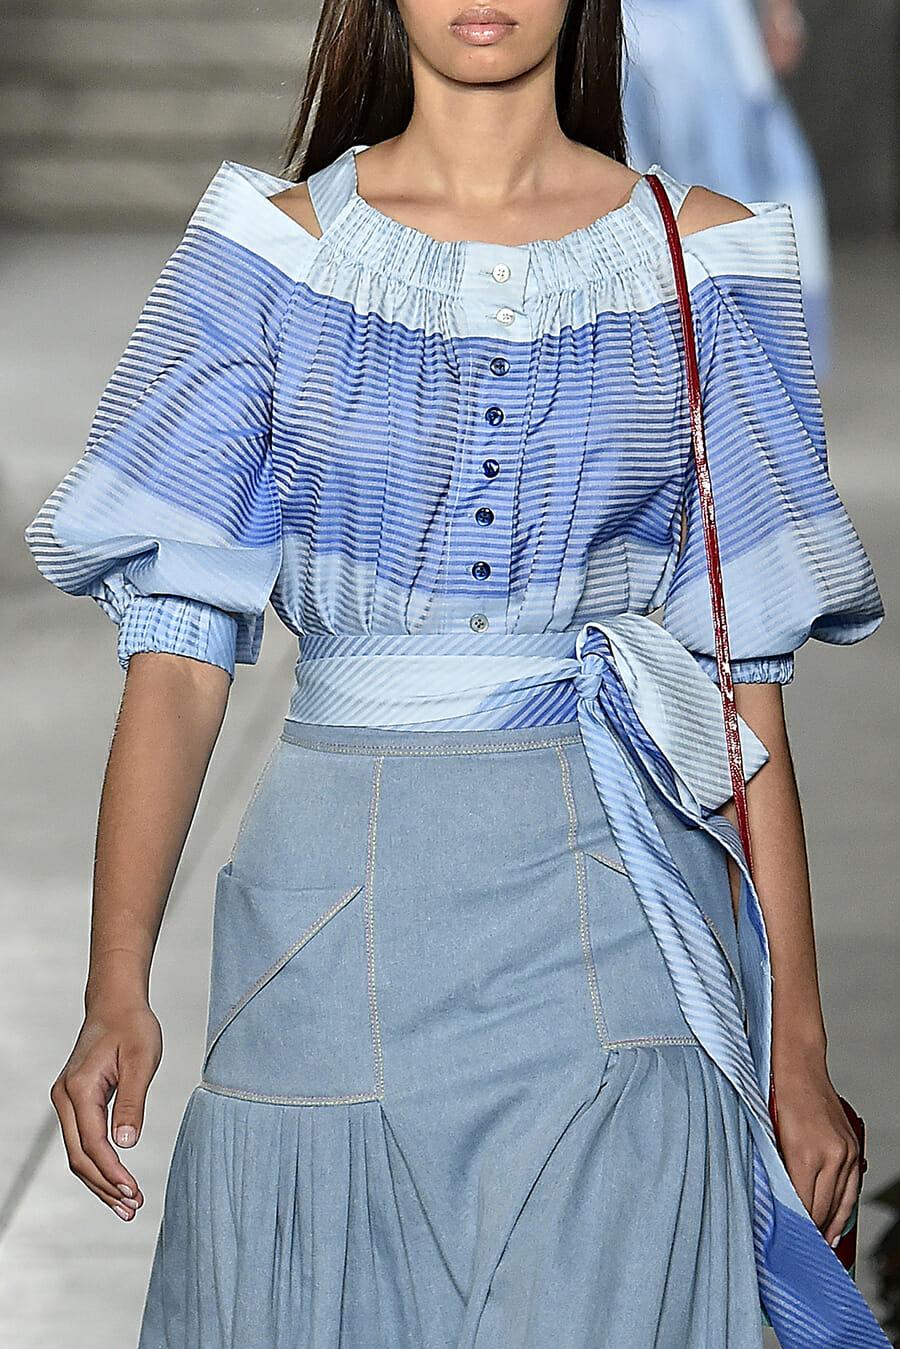 Carolina-Herrera-New-York-Fashion-Week-Spring-Summer-2018-NY-September-2017-look10-detail2